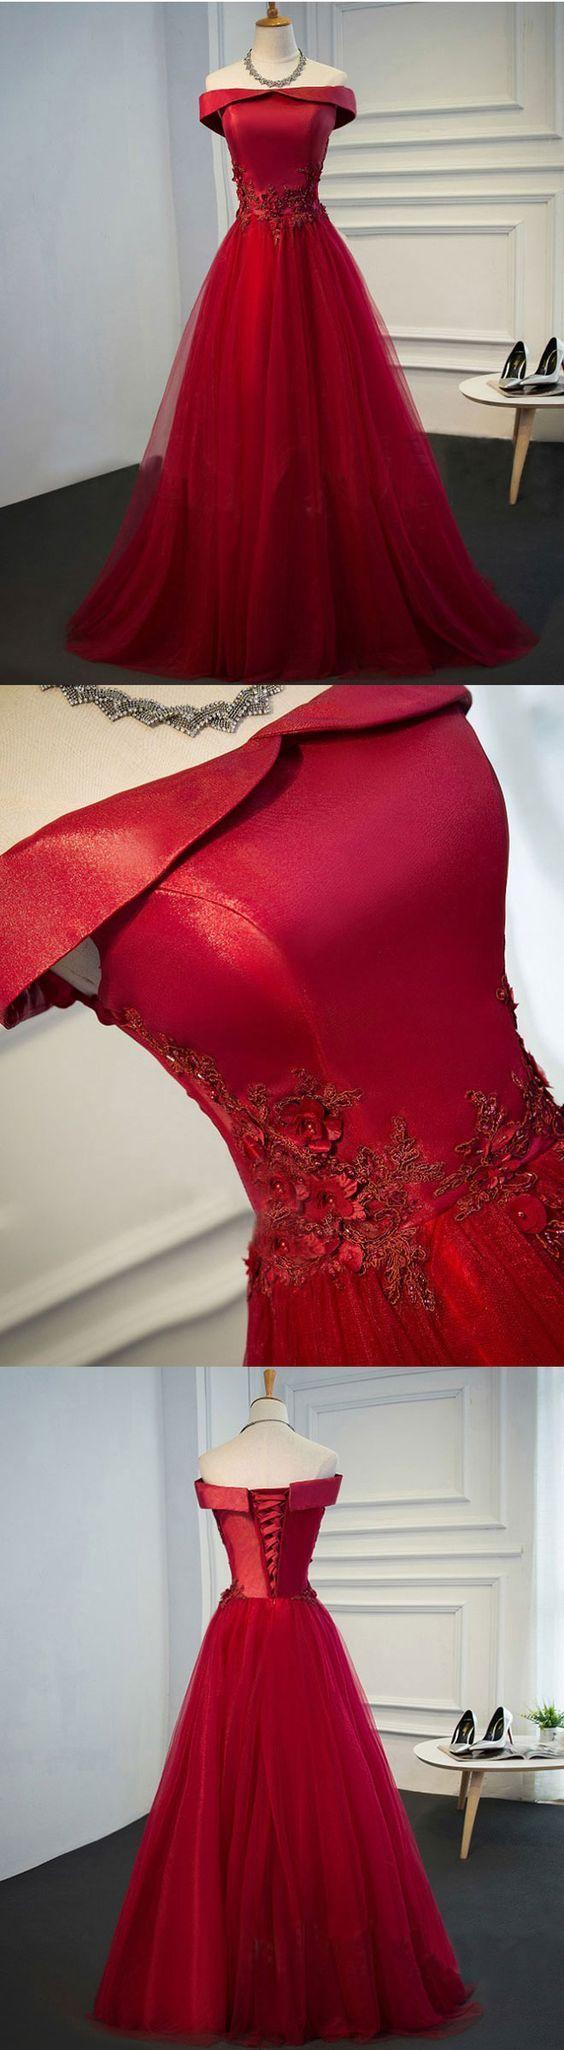 Burgundy lace tulle long prom dress off shoulder evening dress